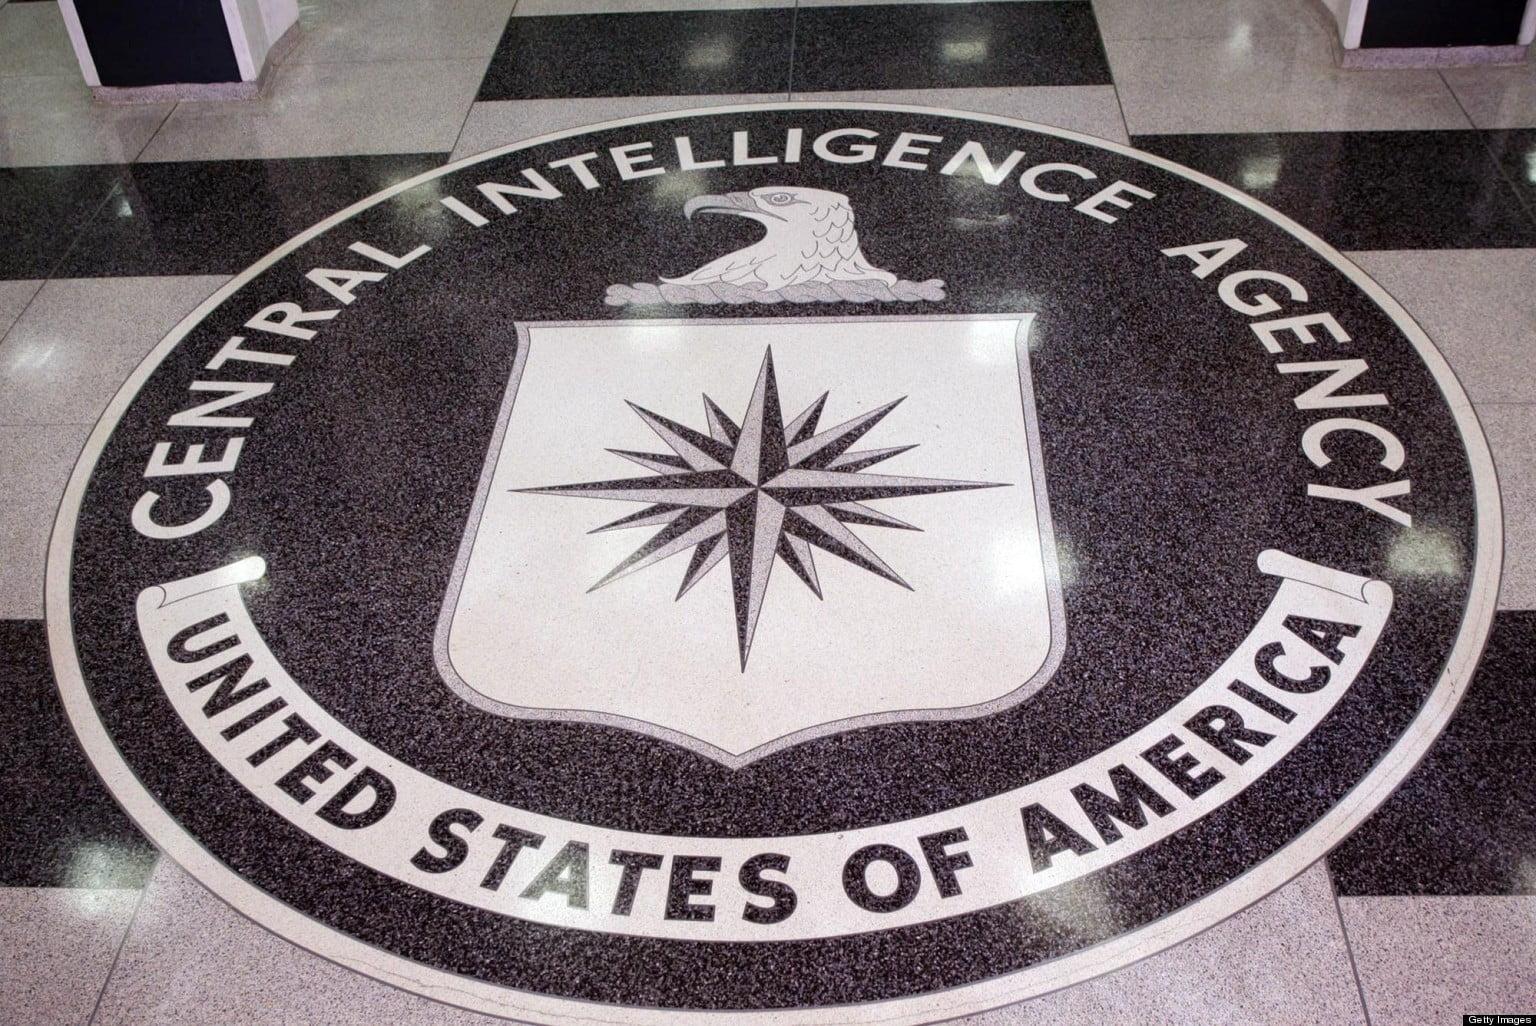 wikileaks-opublikoval-8-tysyach-dokumentov-tsru